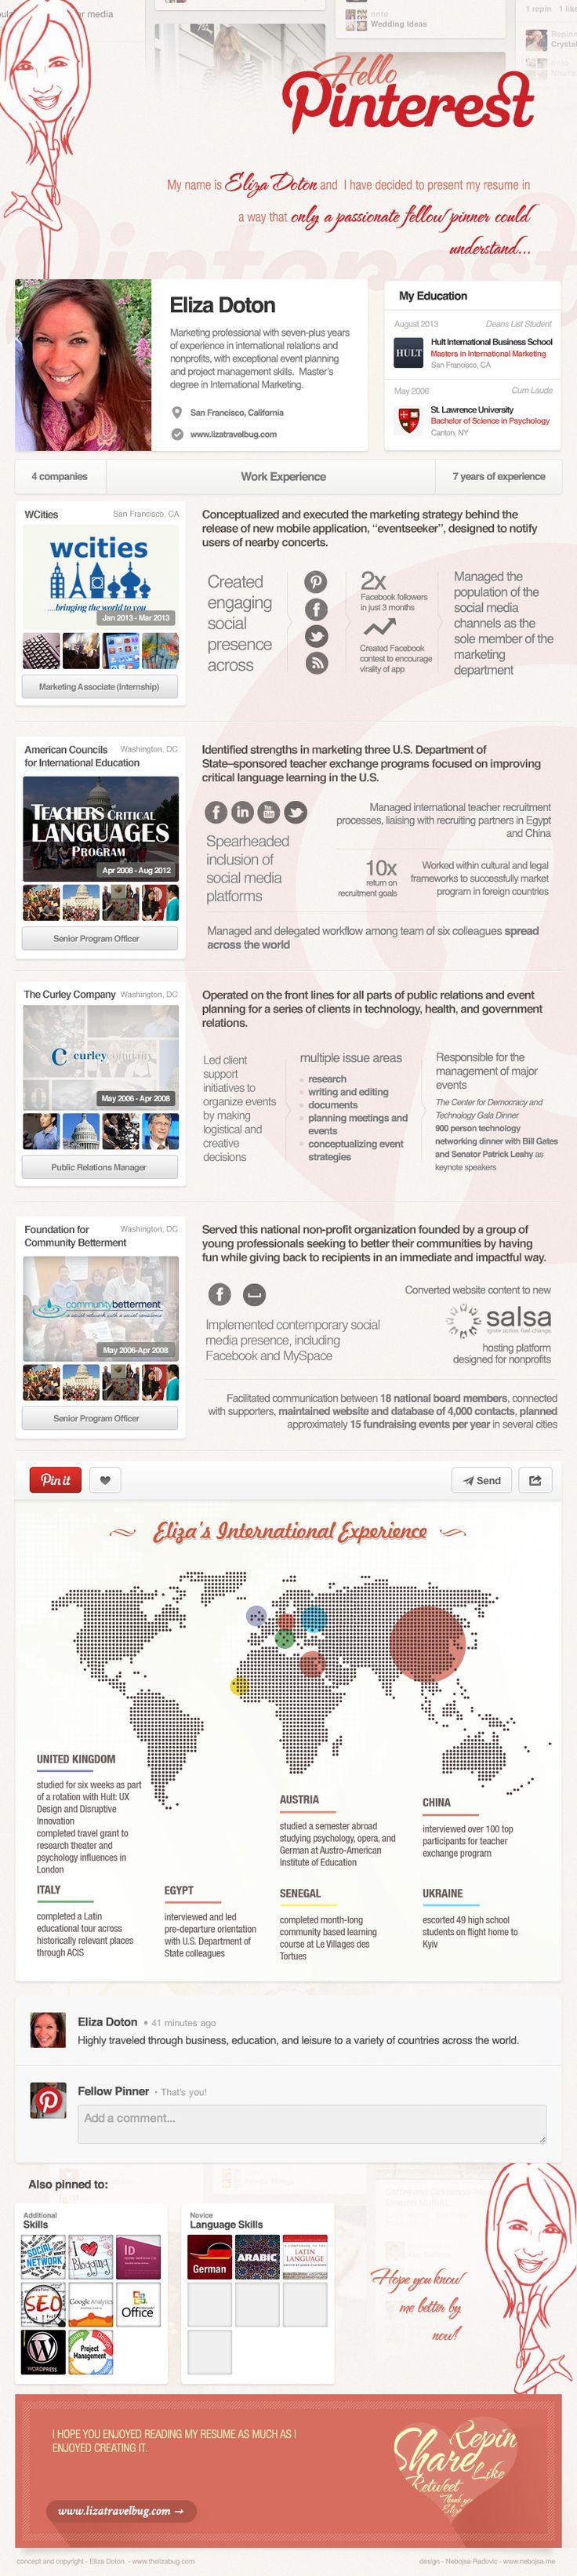 eliza doton pinterest infographic cv